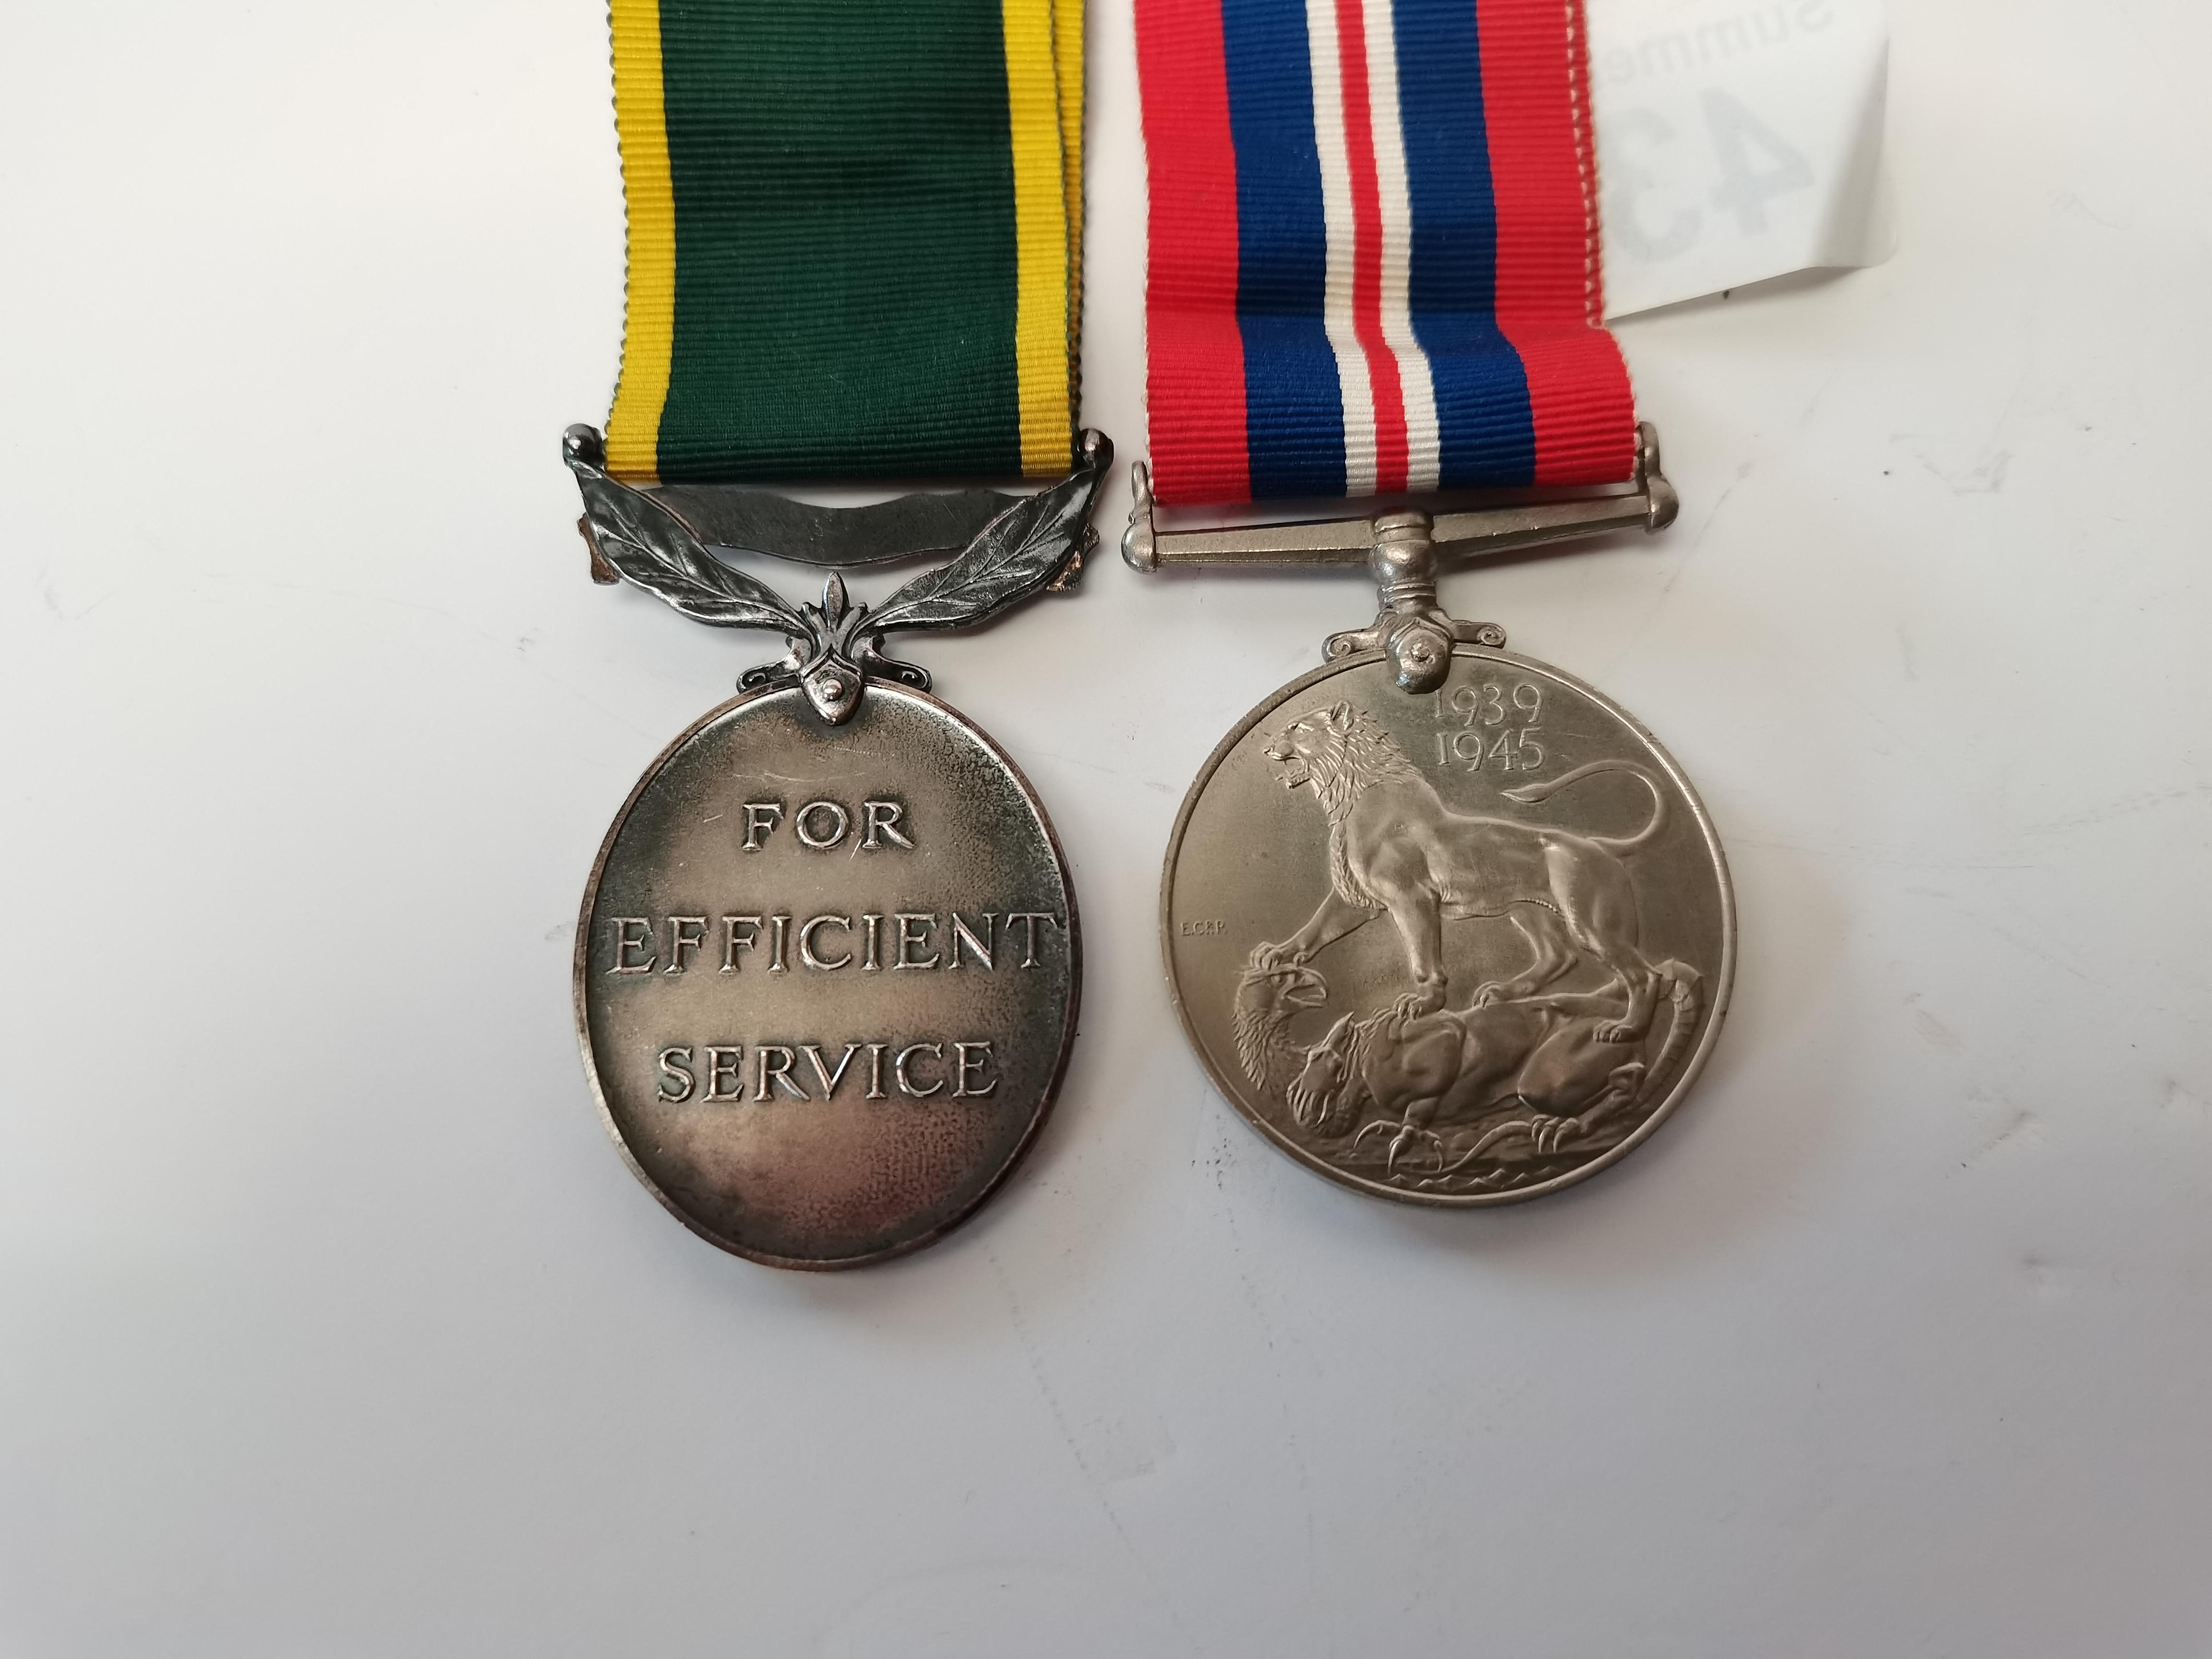 War medal 1939-45 and territorial medal 910872 BDR KM HUNTER RA - Image 2 of 2